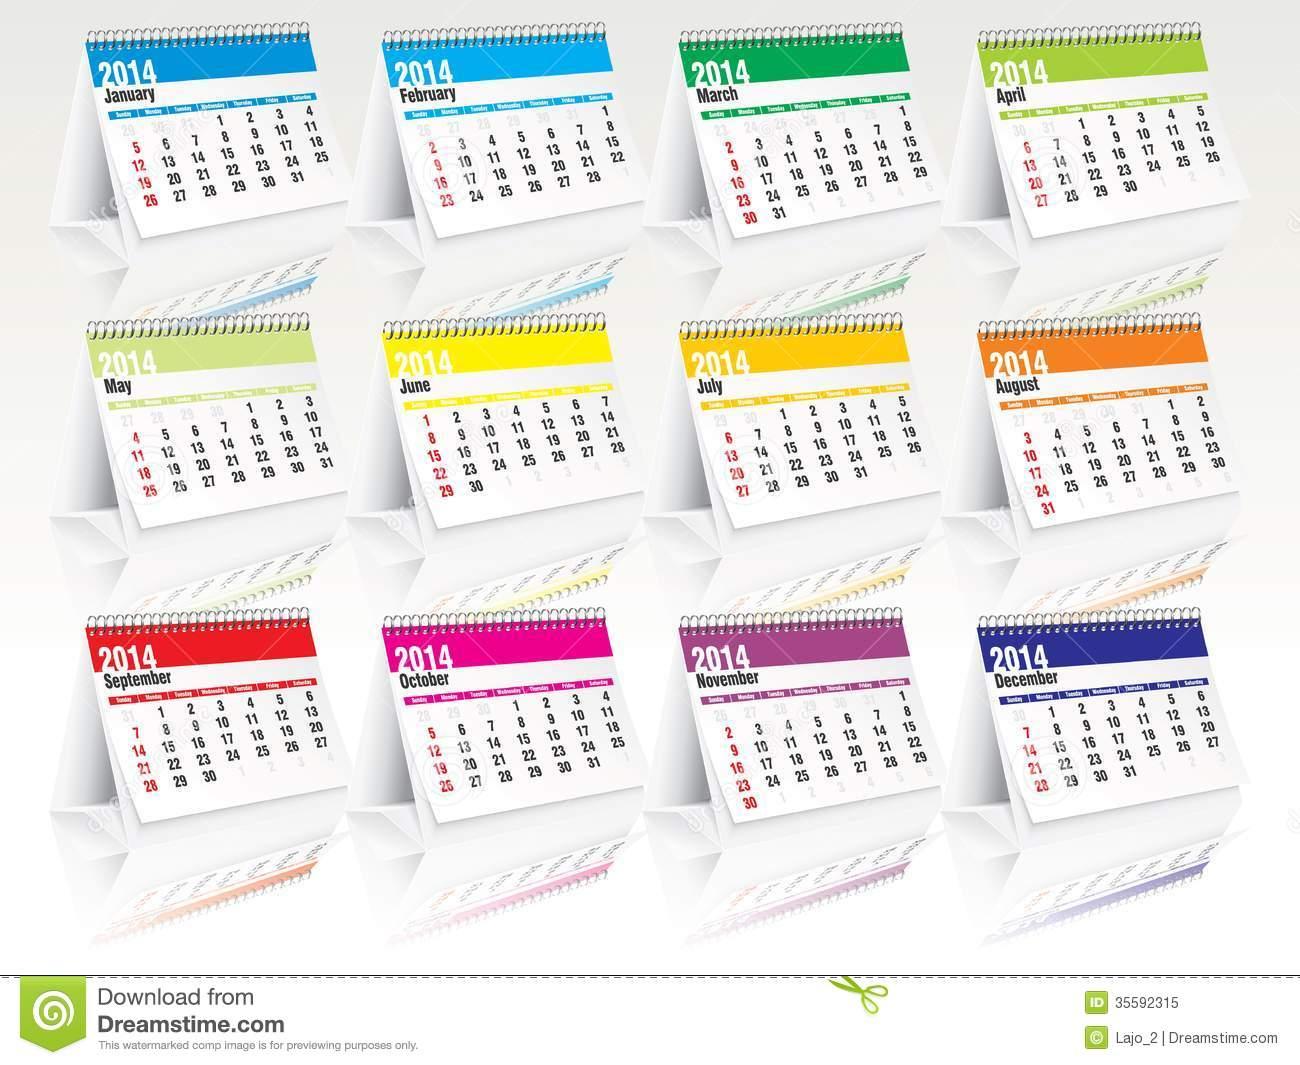 Free 2014 Desk Calendars